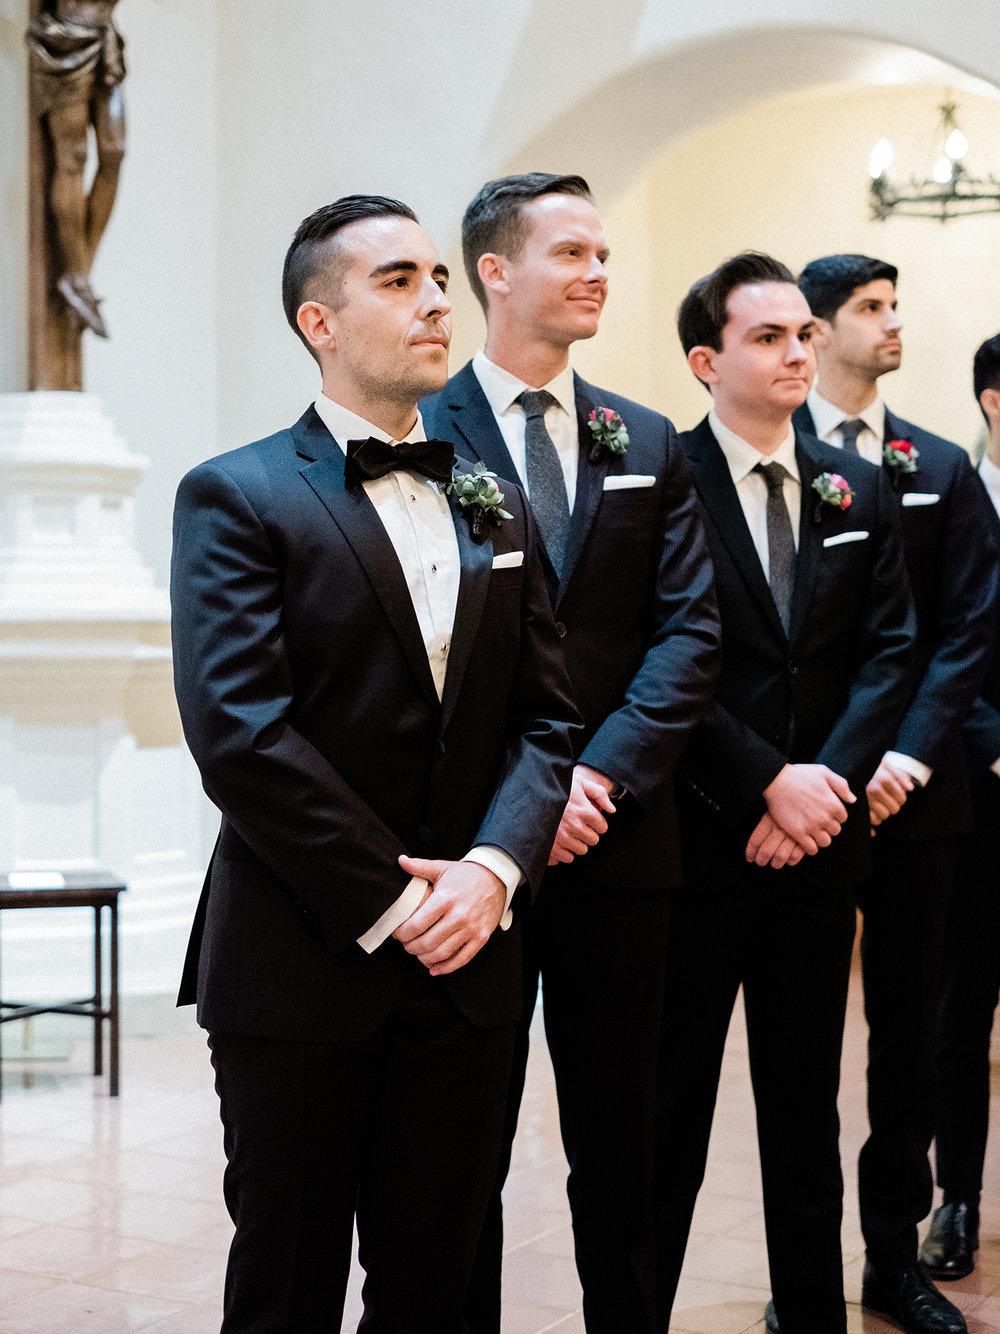 wedding-planner (42).jpg